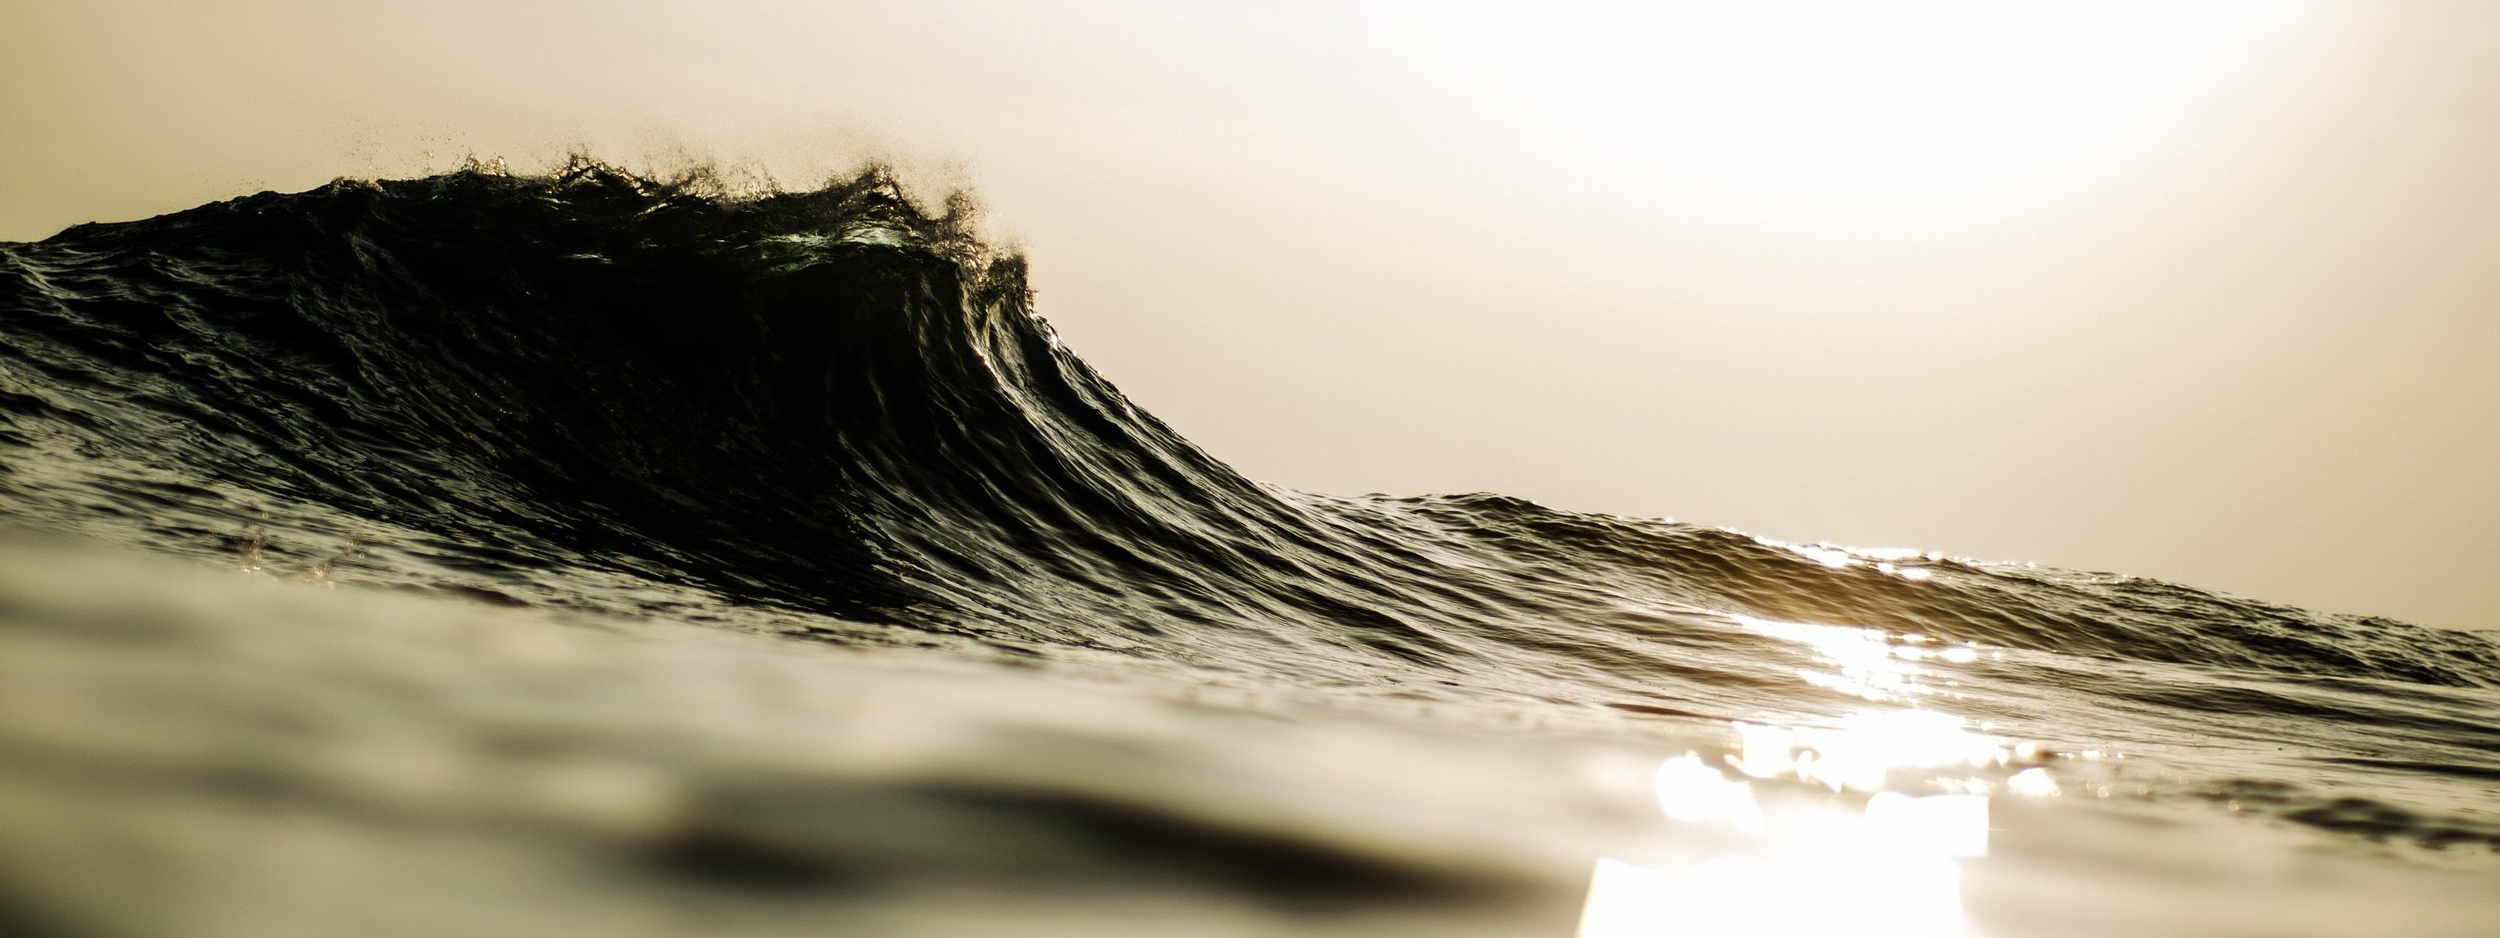 bali-beach-yoga-surf-retreat-dawn.jpg